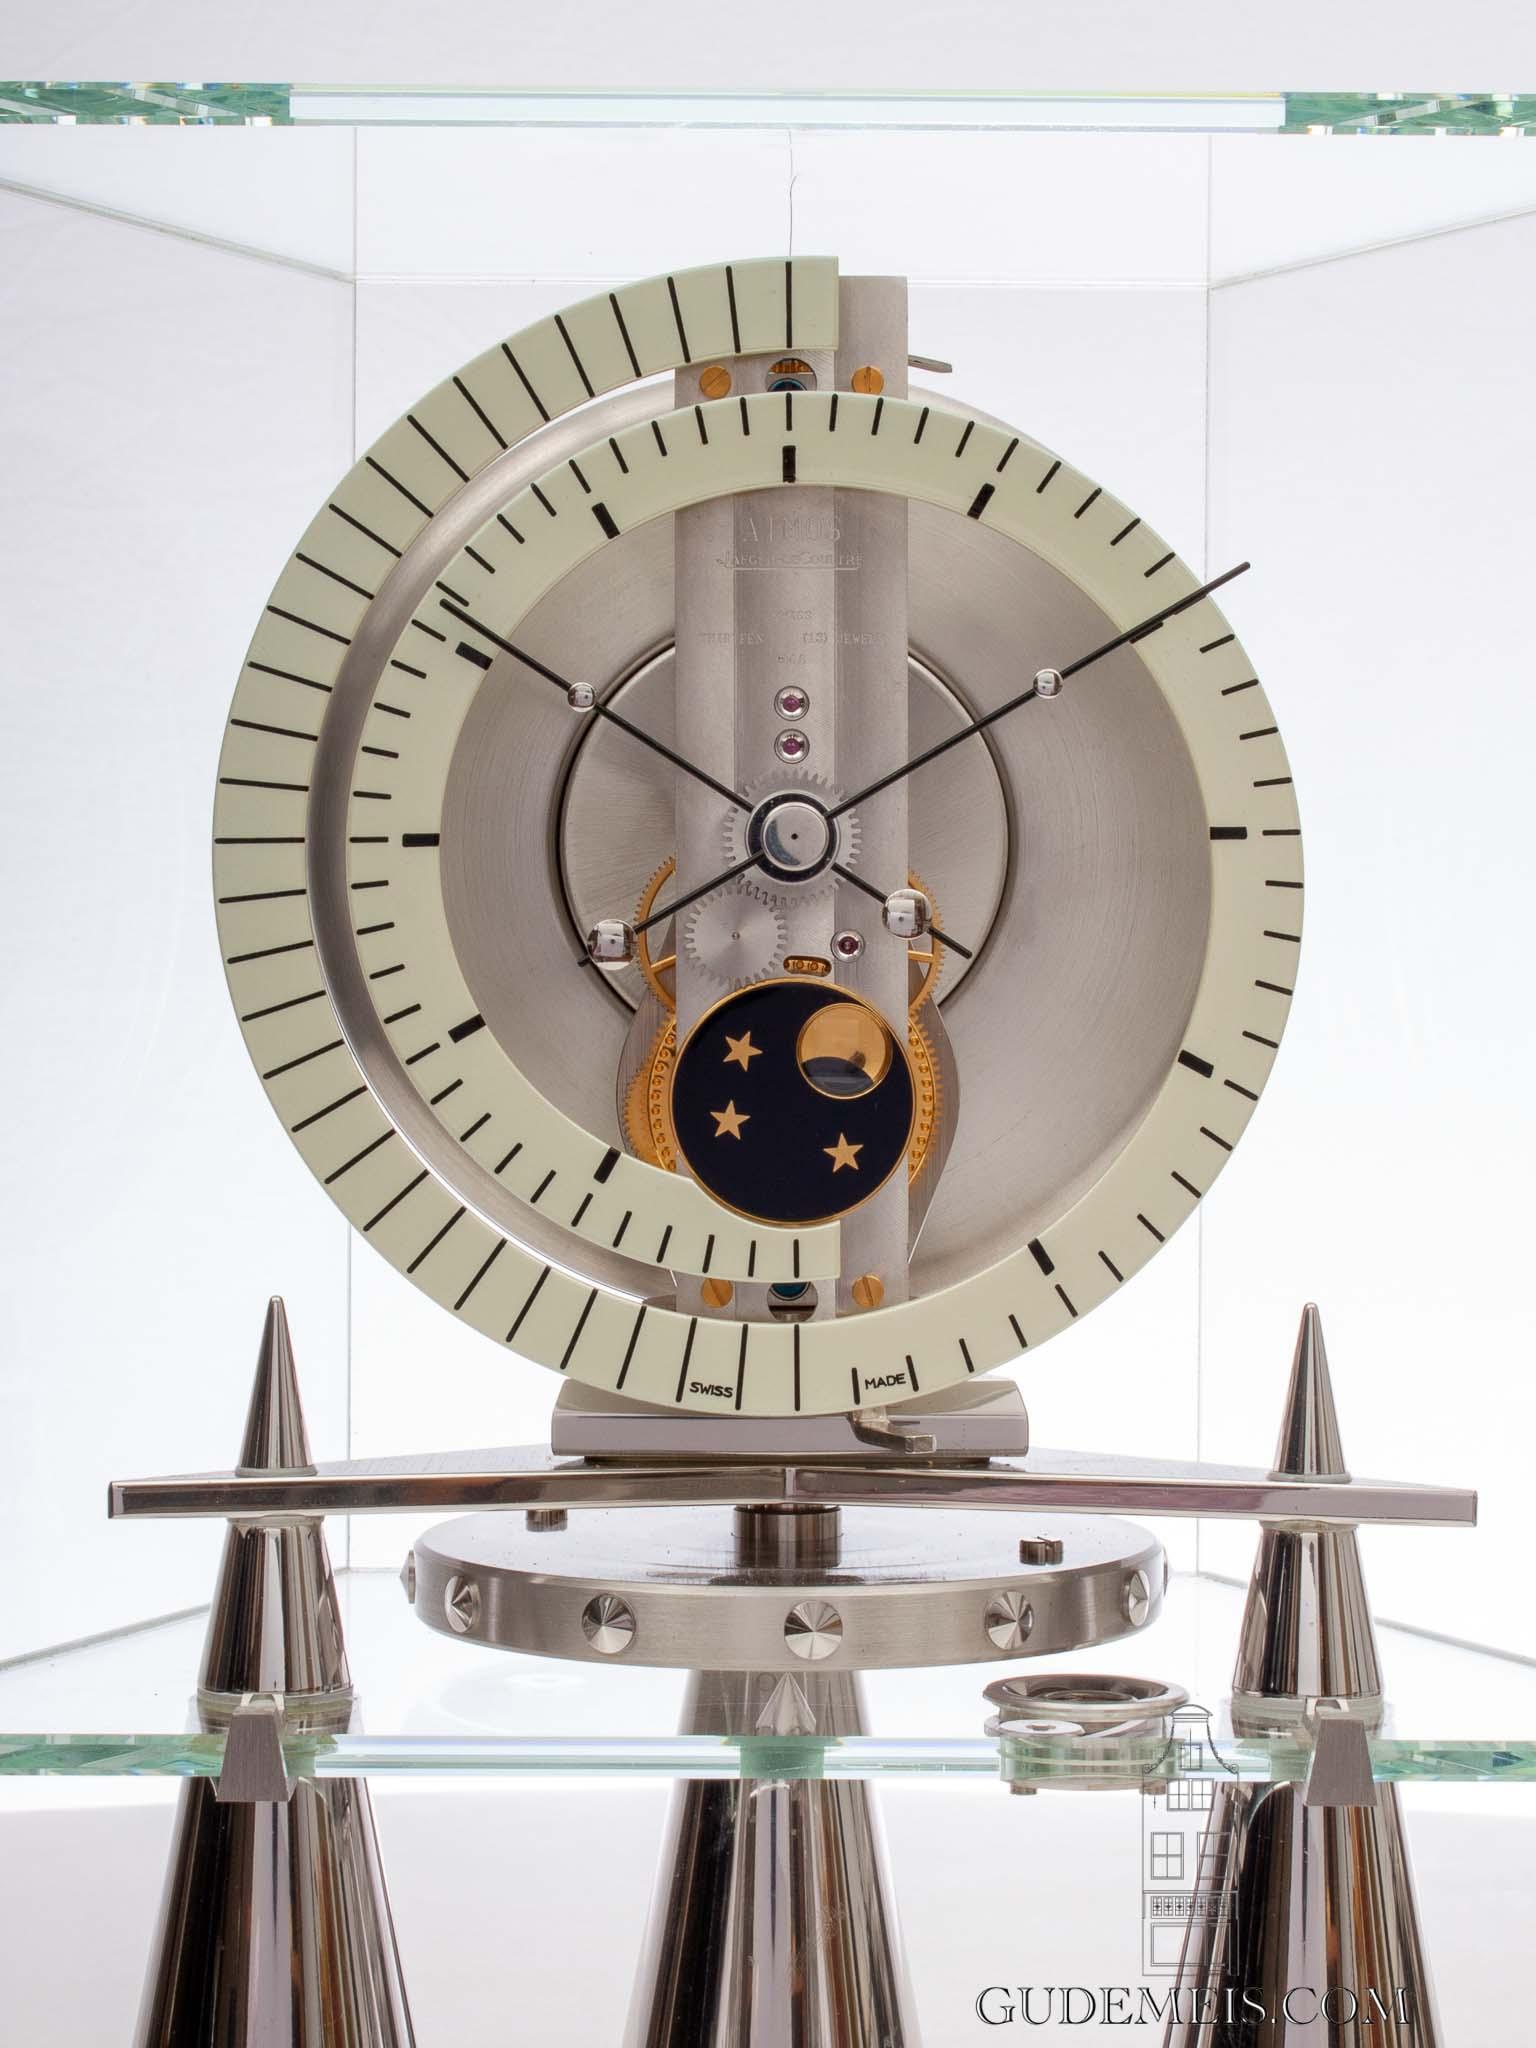 Rhodium-atmos-atlantis-jaeger-lecoultre-JaegerLecoultre-moonphase-design-perpetuum-mobile-perpetual